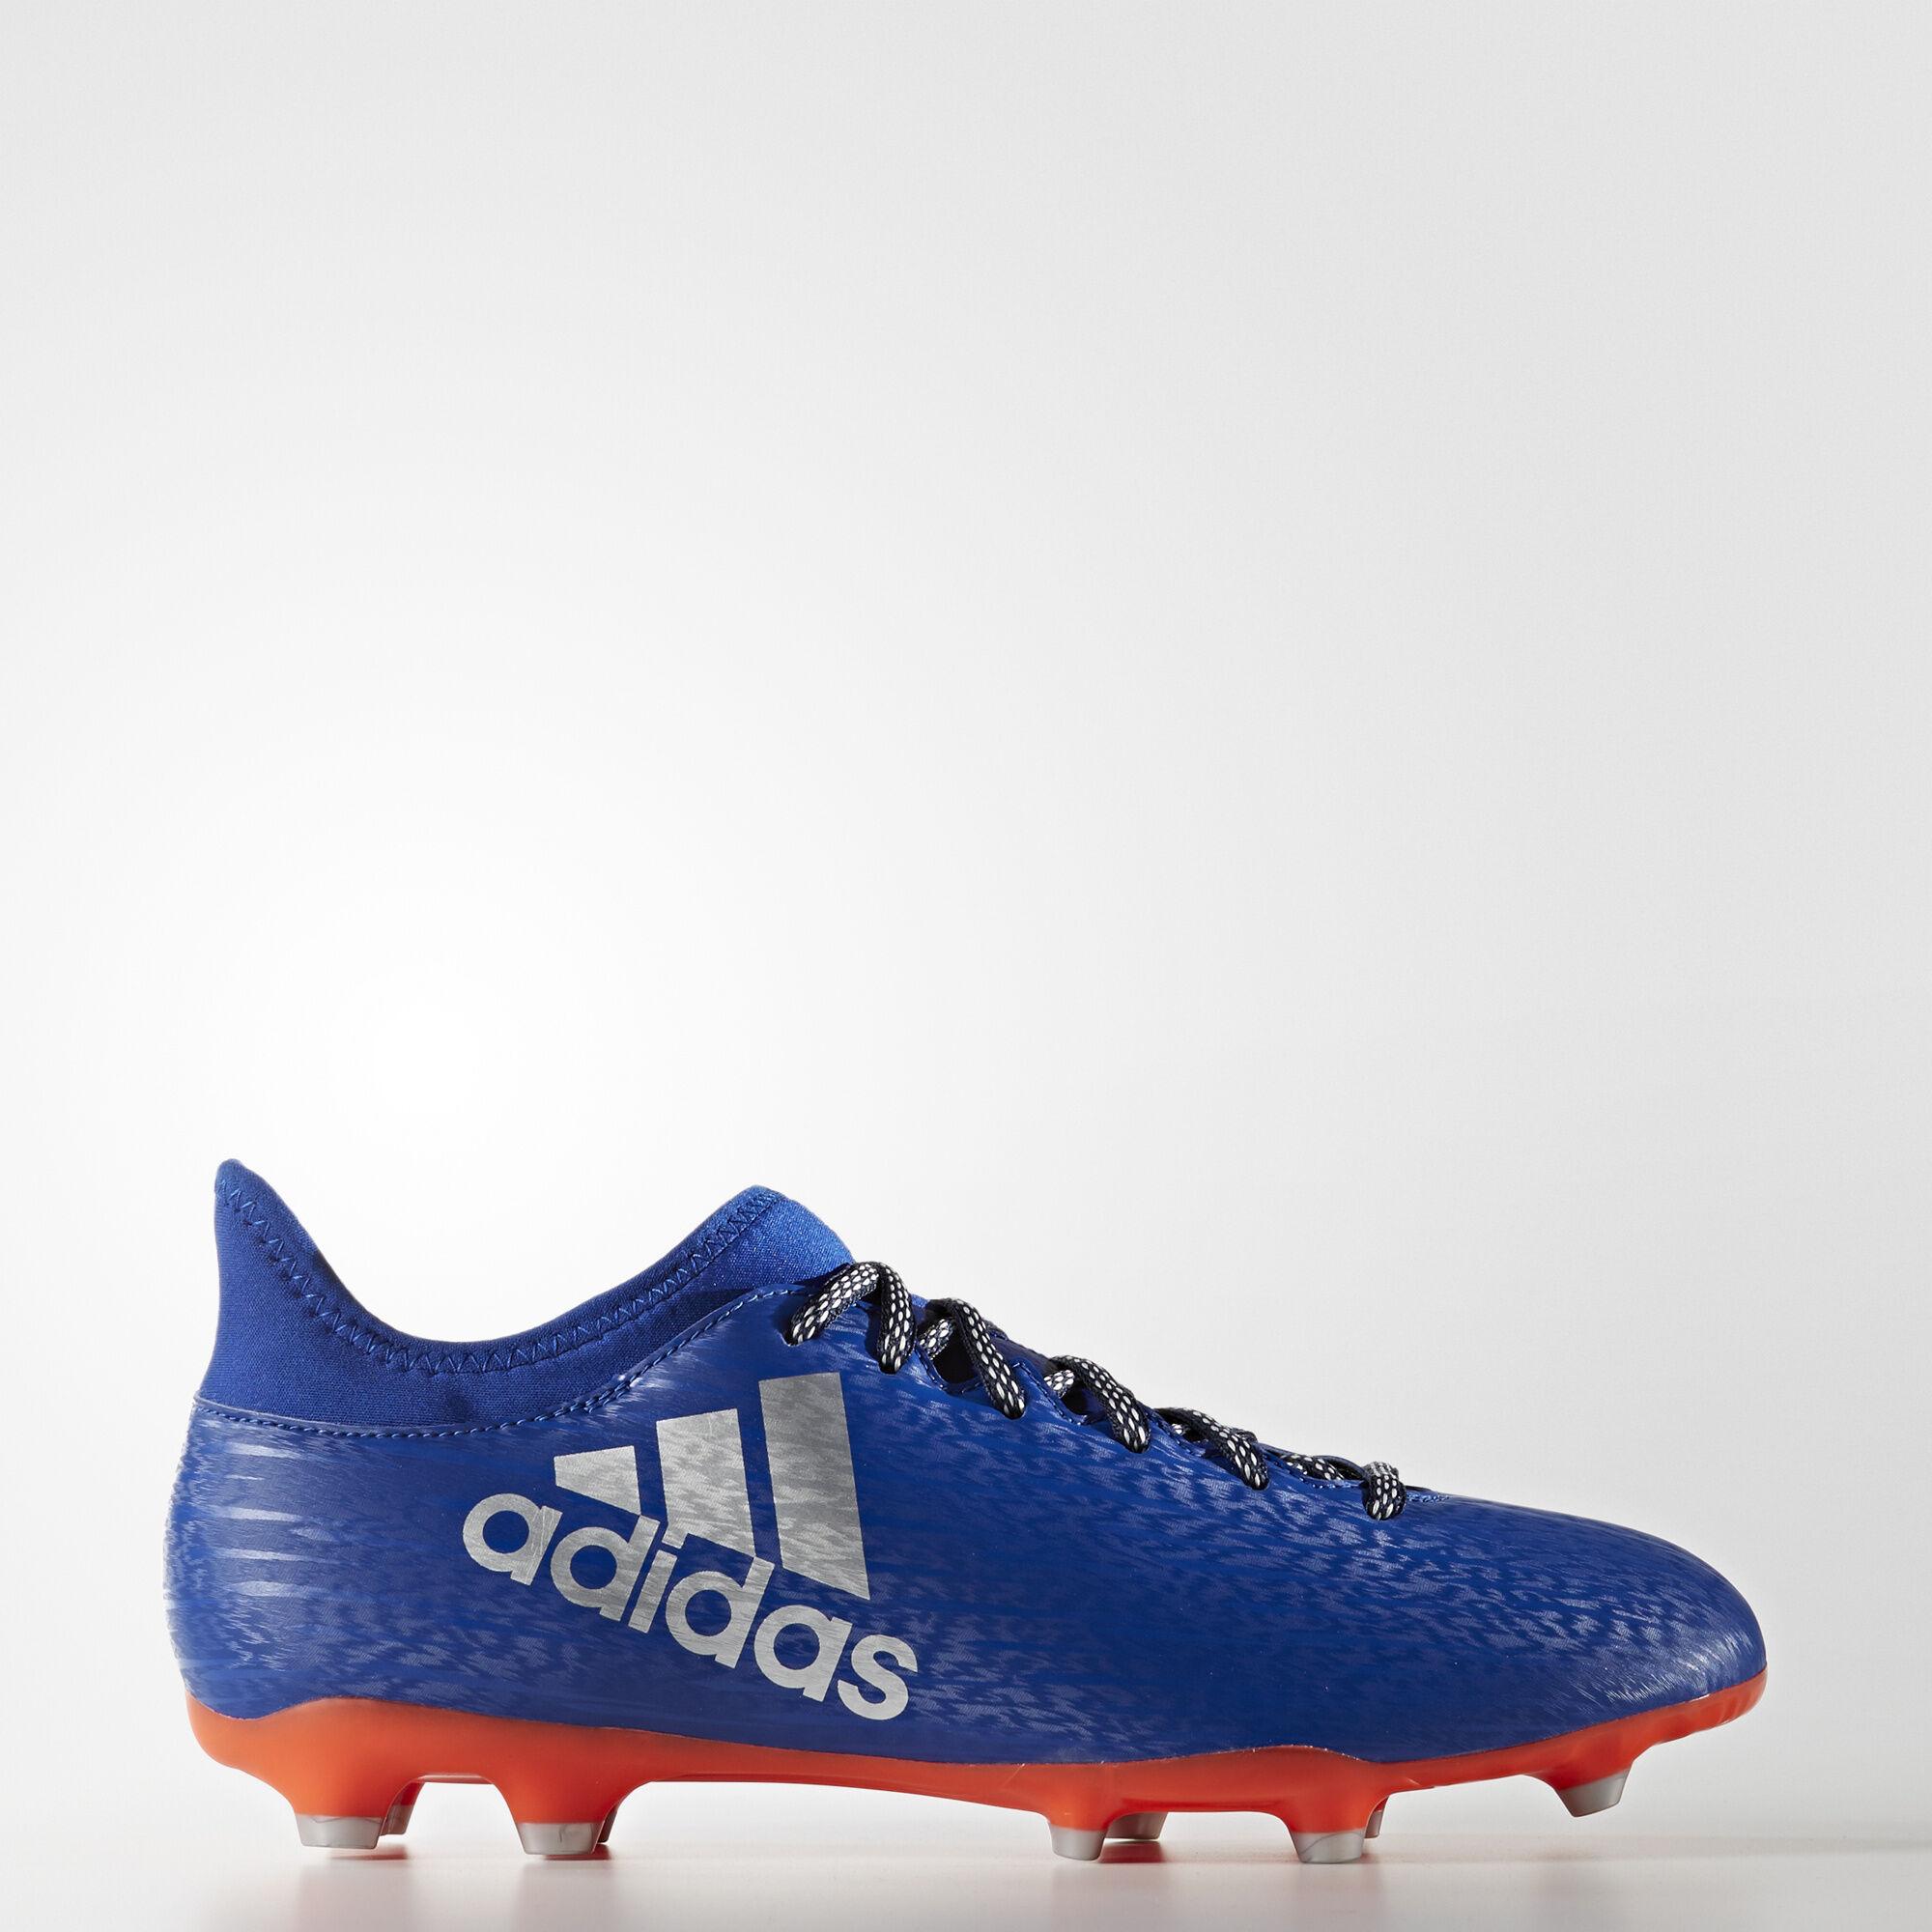 Adidas X 16.3 Azules